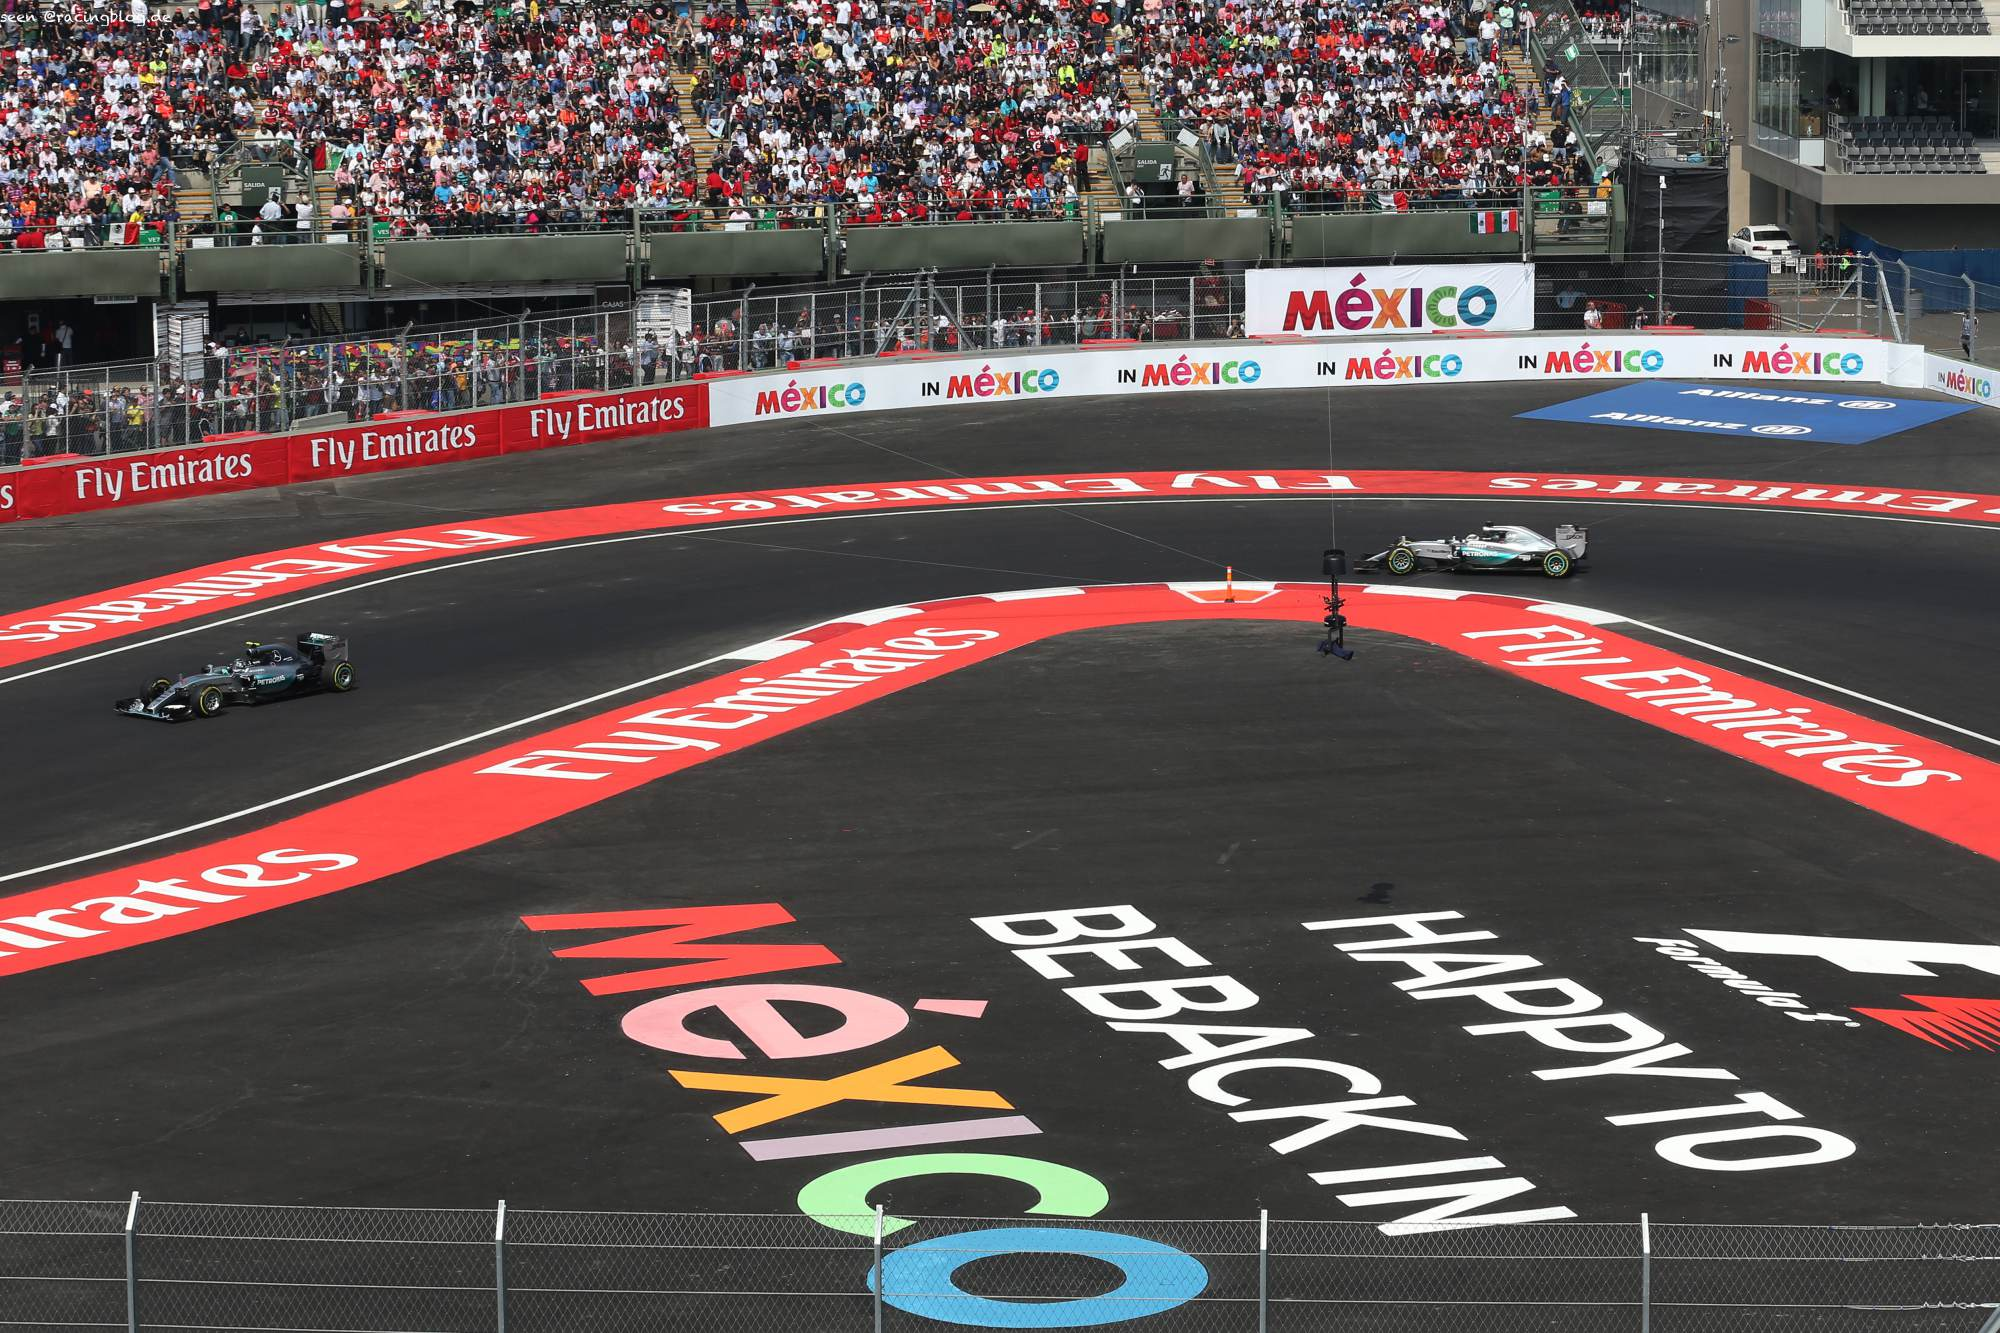 f1 race mexico 2015 19 racingblog. Black Bedroom Furniture Sets. Home Design Ideas